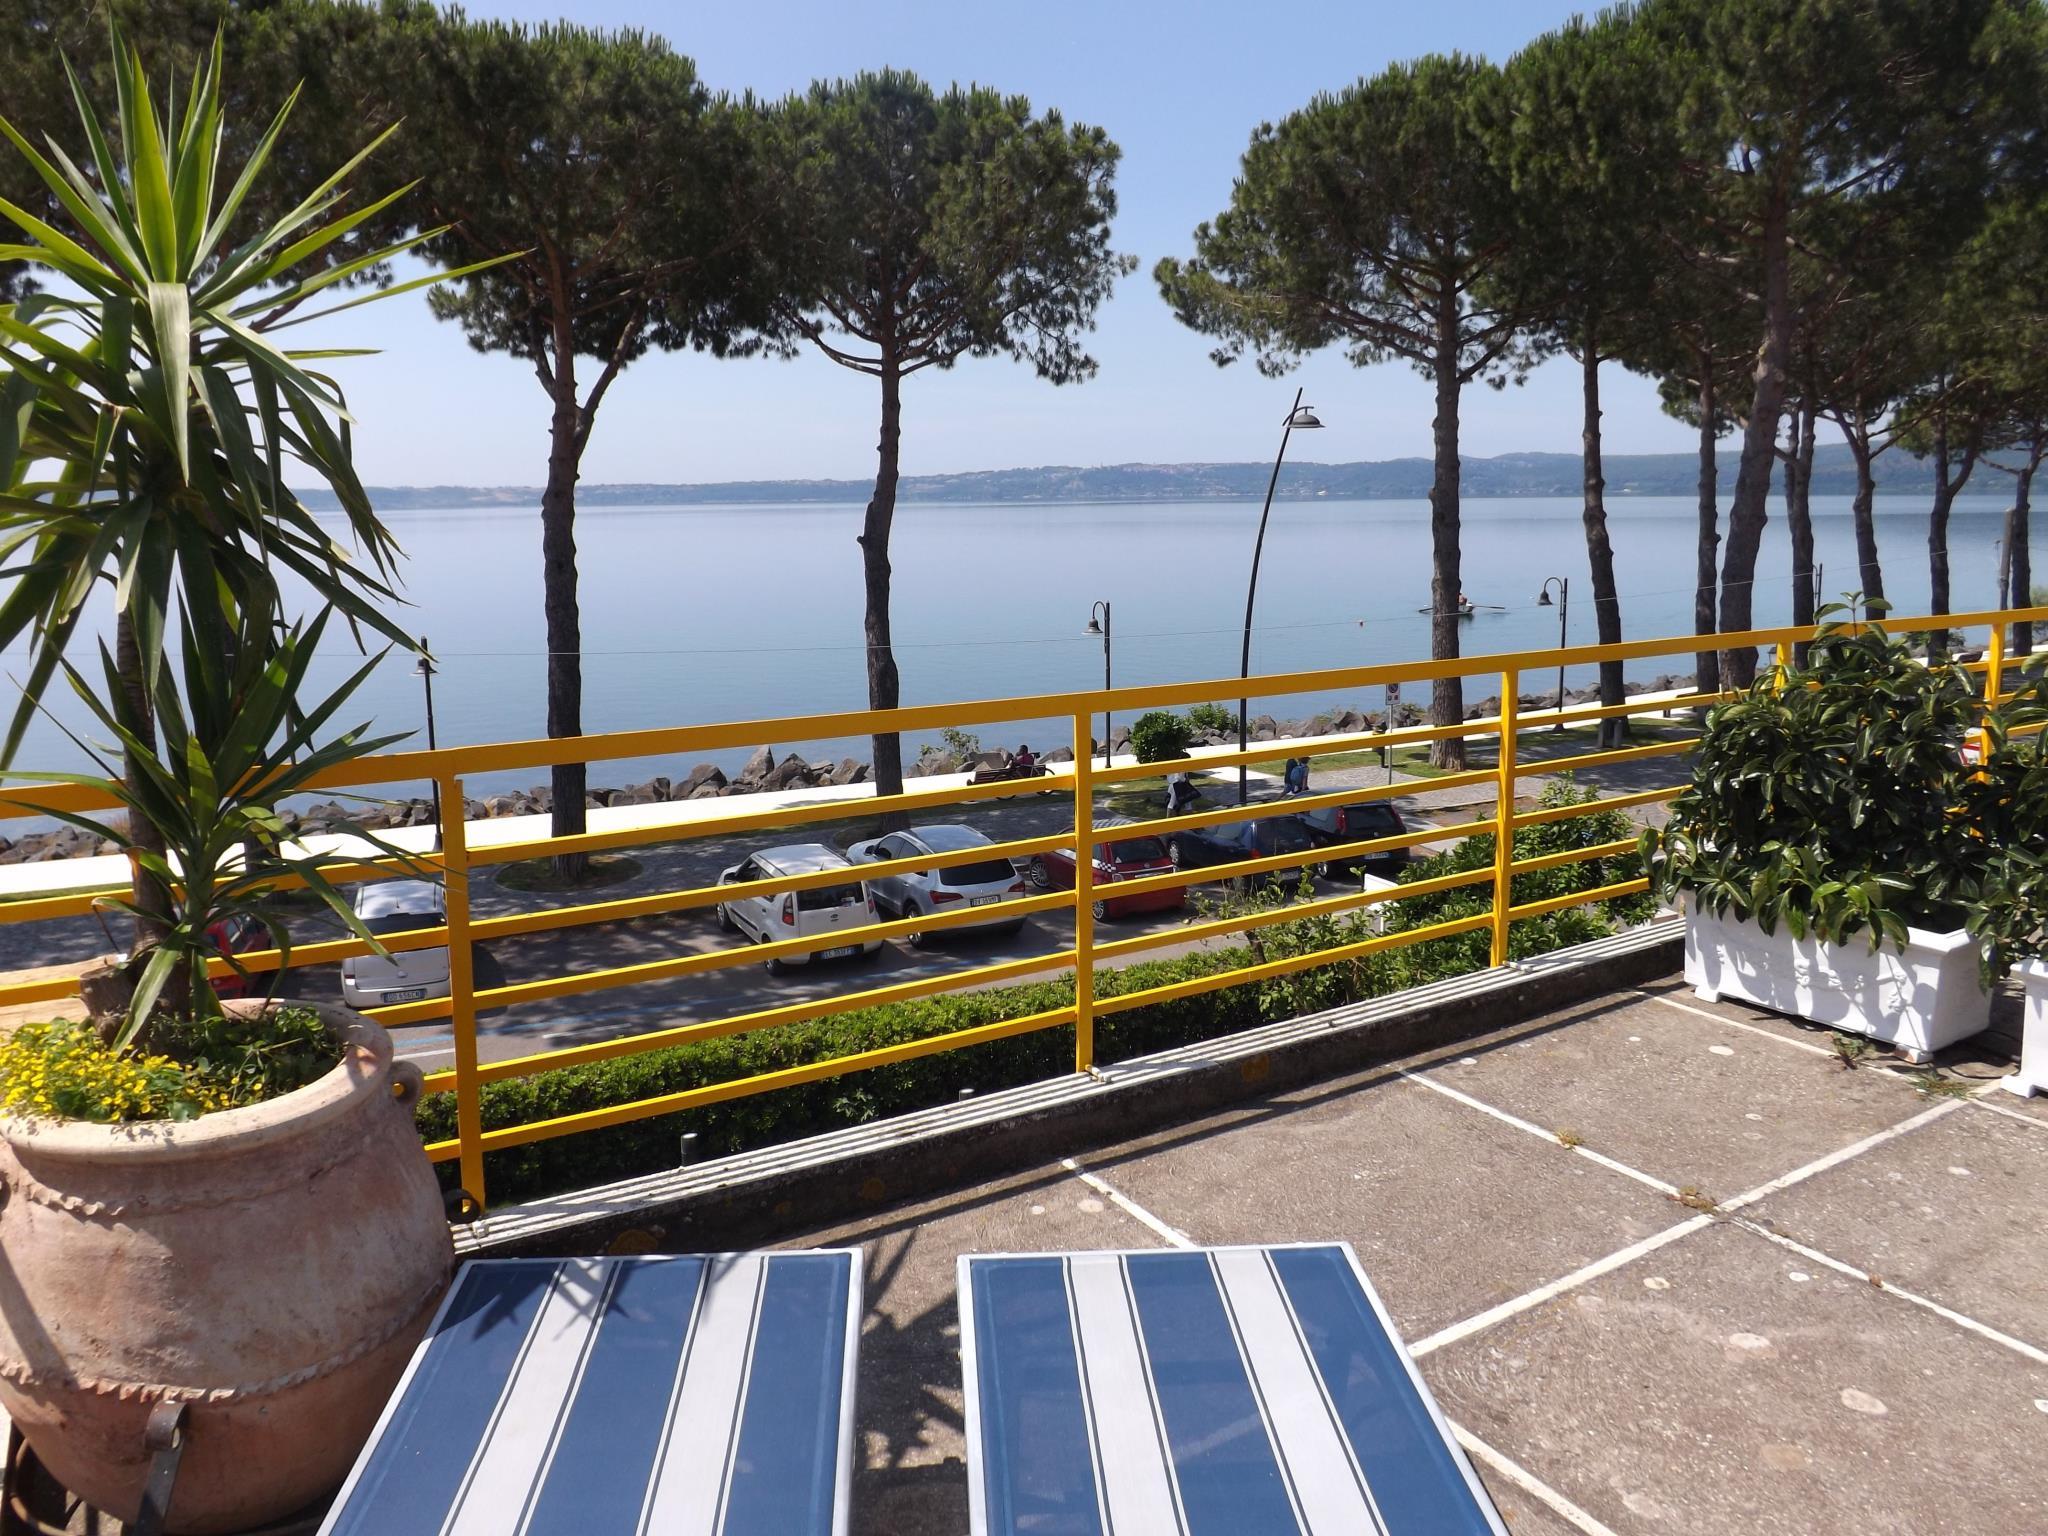 B B La Terrazza Sul Lago Deals Booking Gh Wego Com